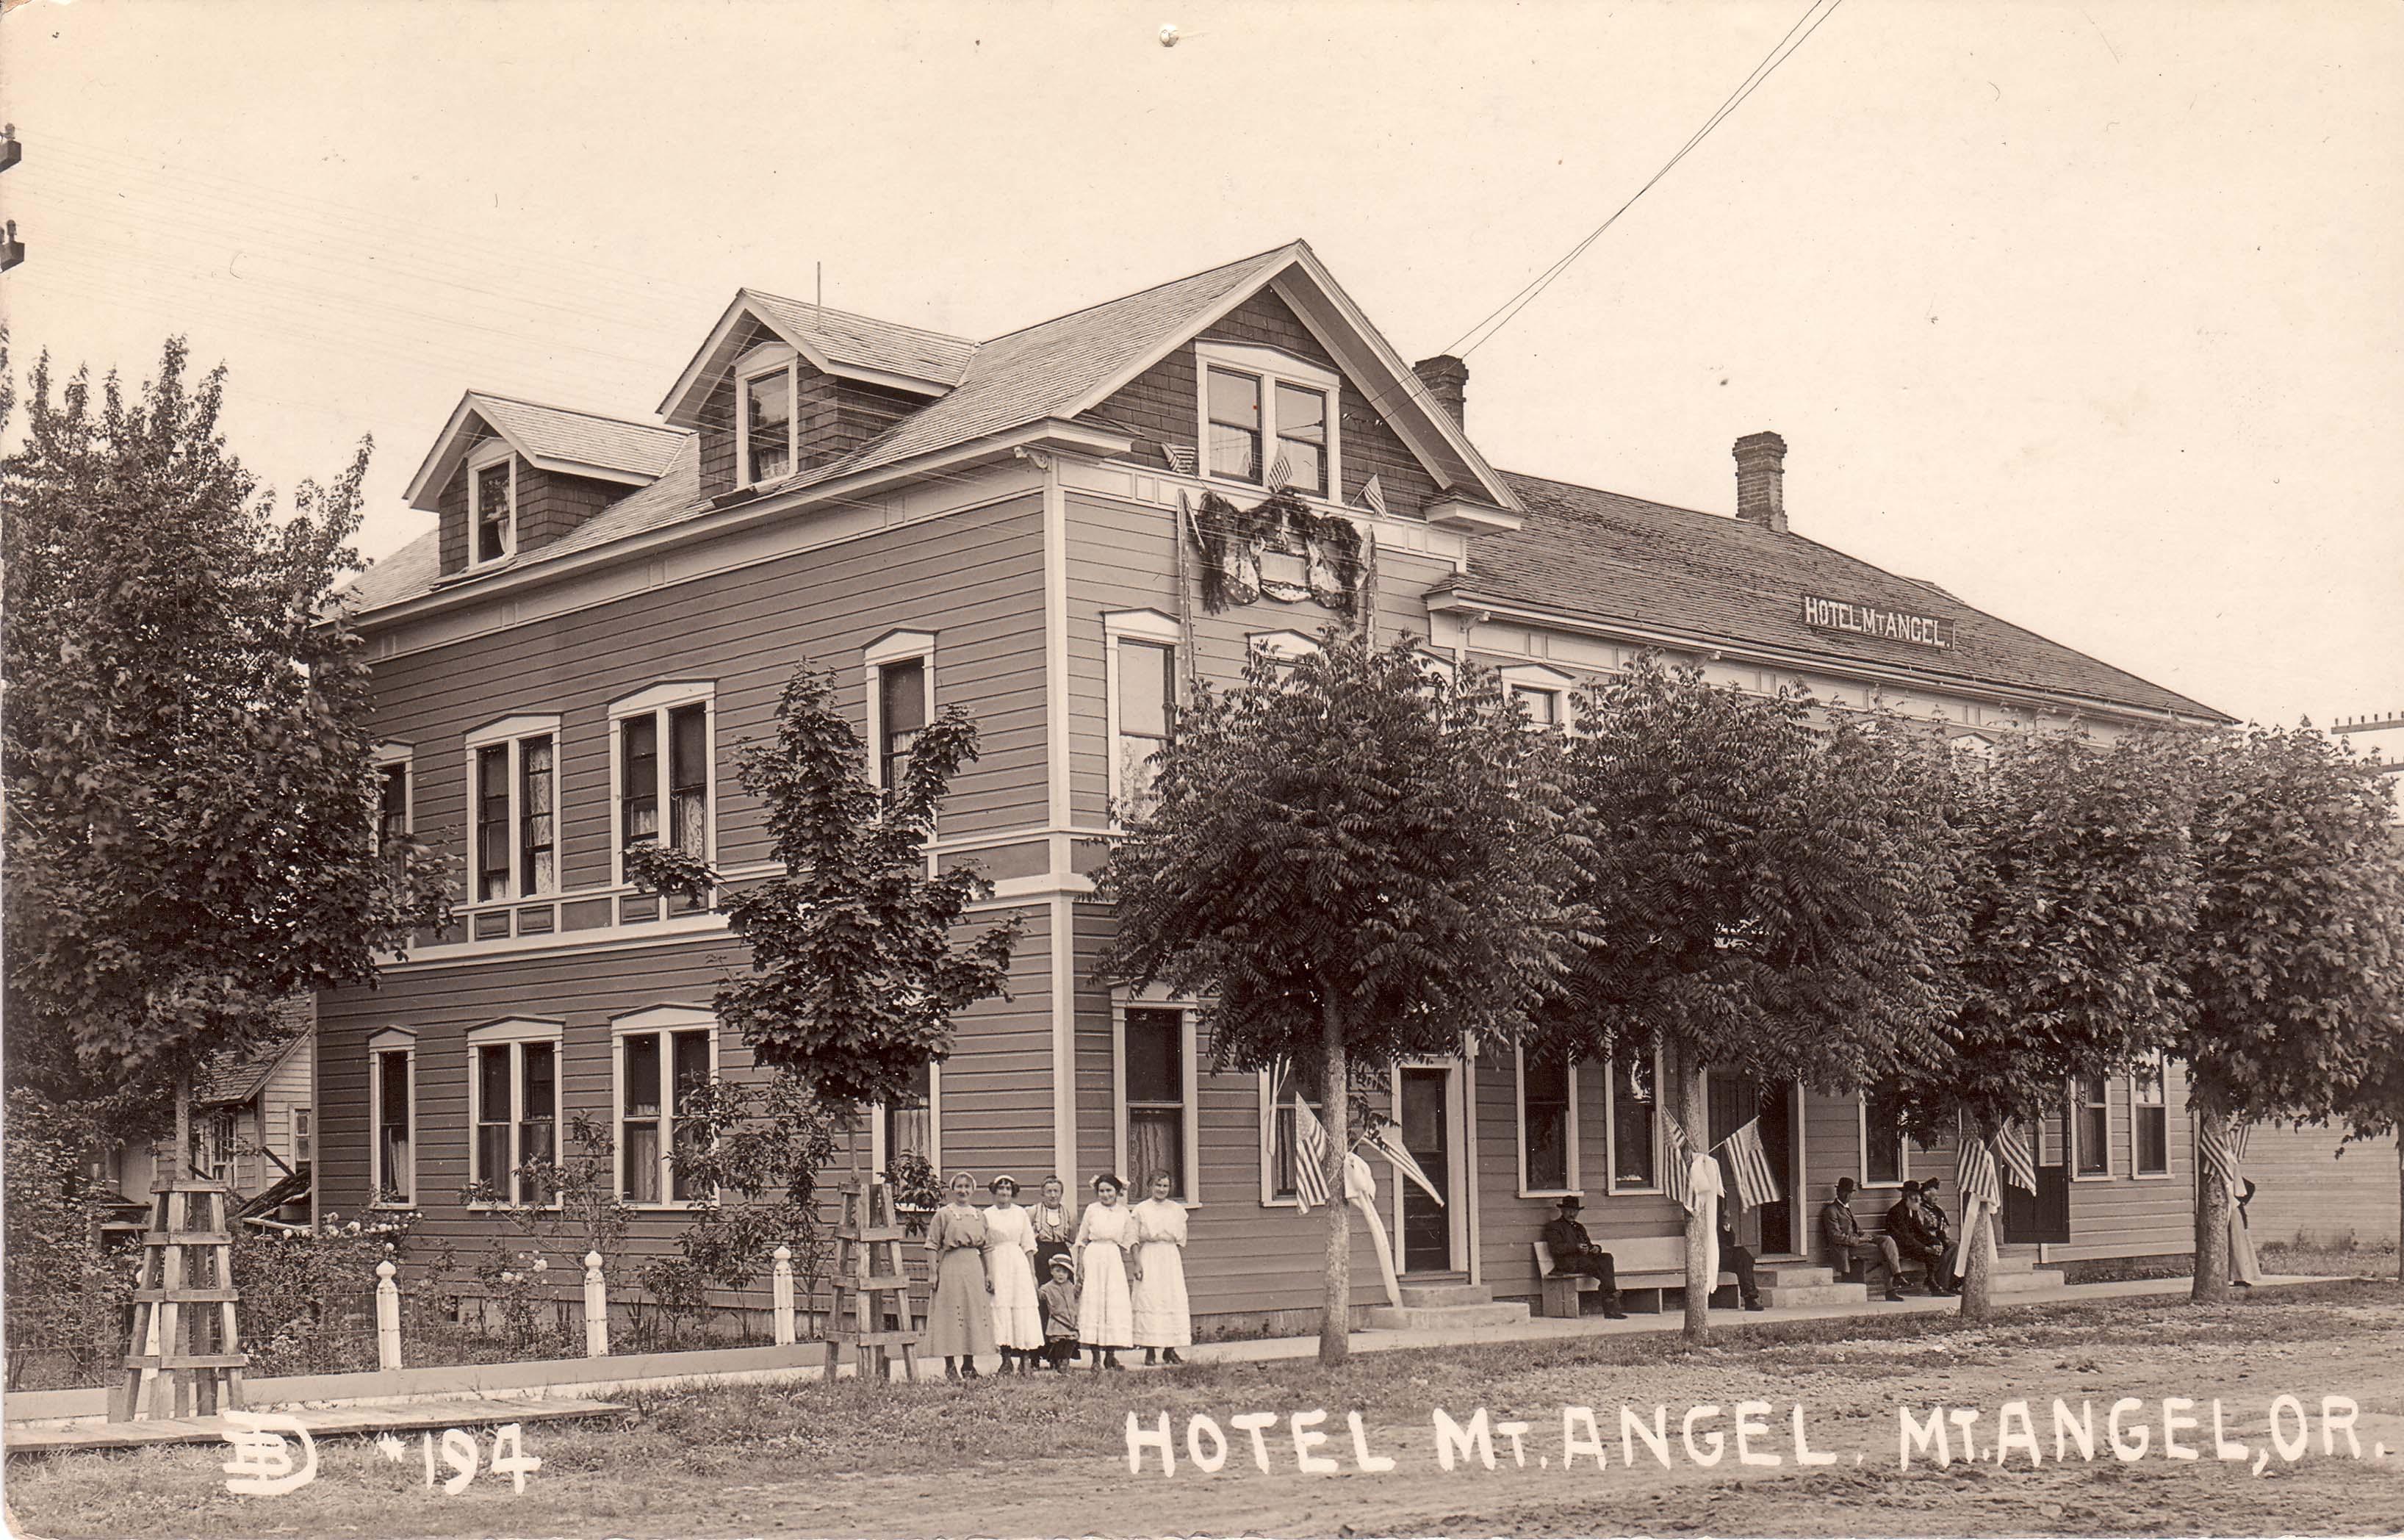 Mt. Angel Hotel